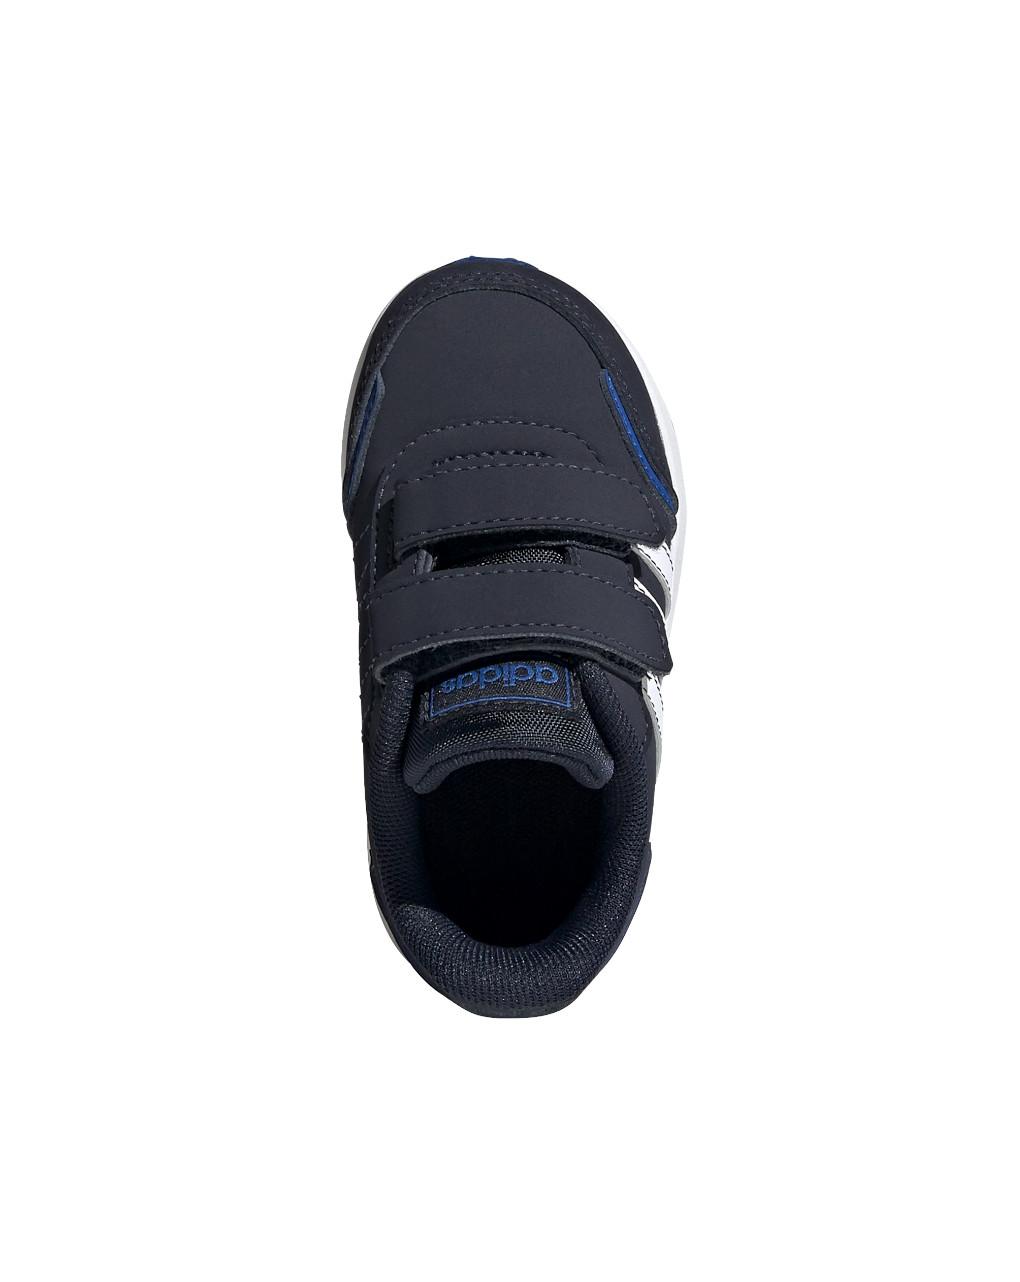 Vs switch 3 i - Nike